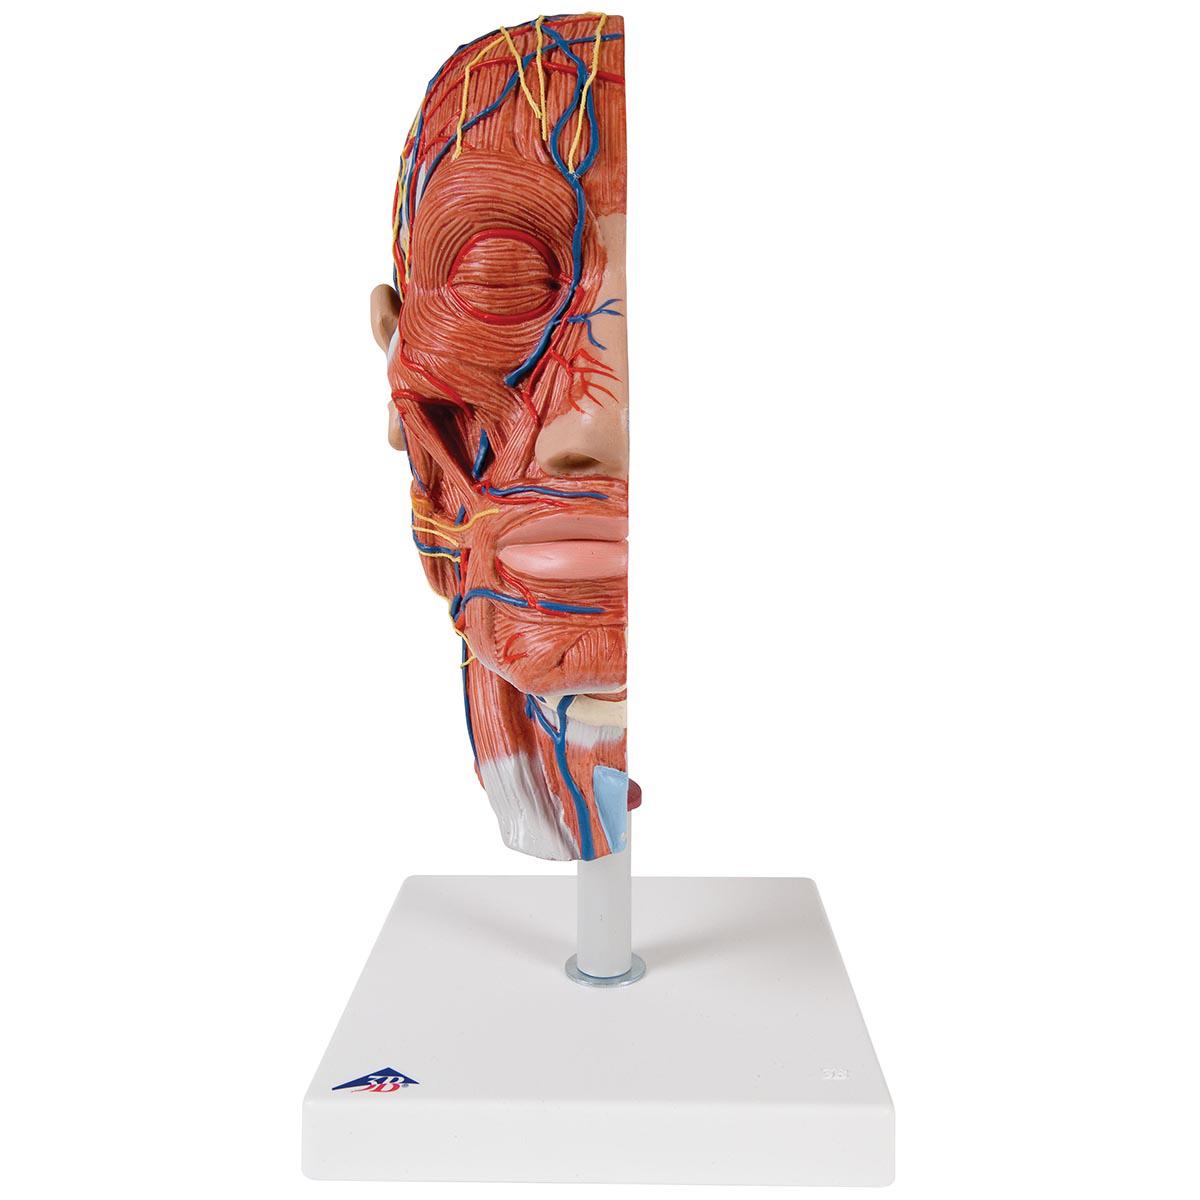 Halber Kopf mit Muskulatur - 1000221 - 3B Scientific - C14 ...